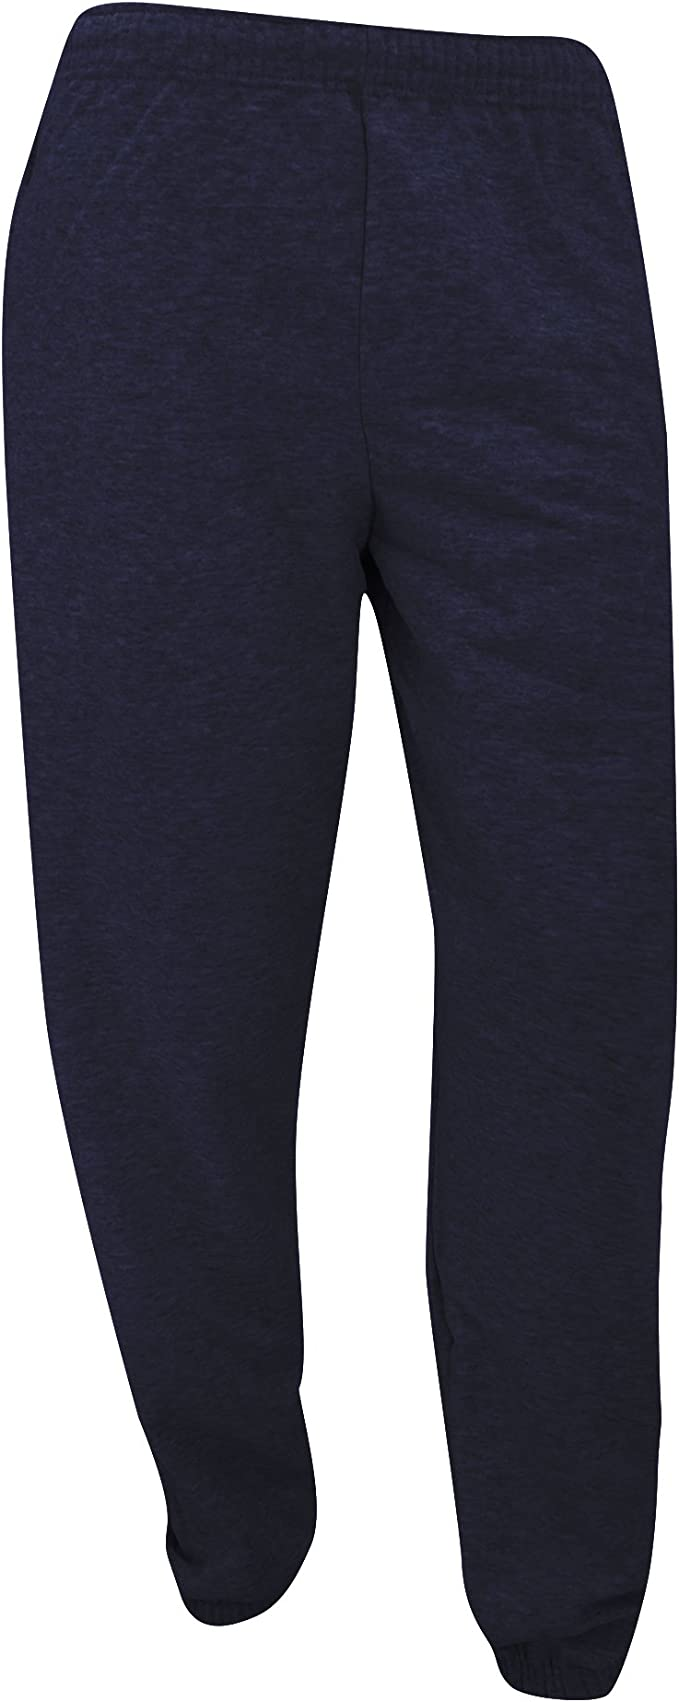 Fruit of the Loom Open Hem Jog Pants Pantalones de Deporte para ...